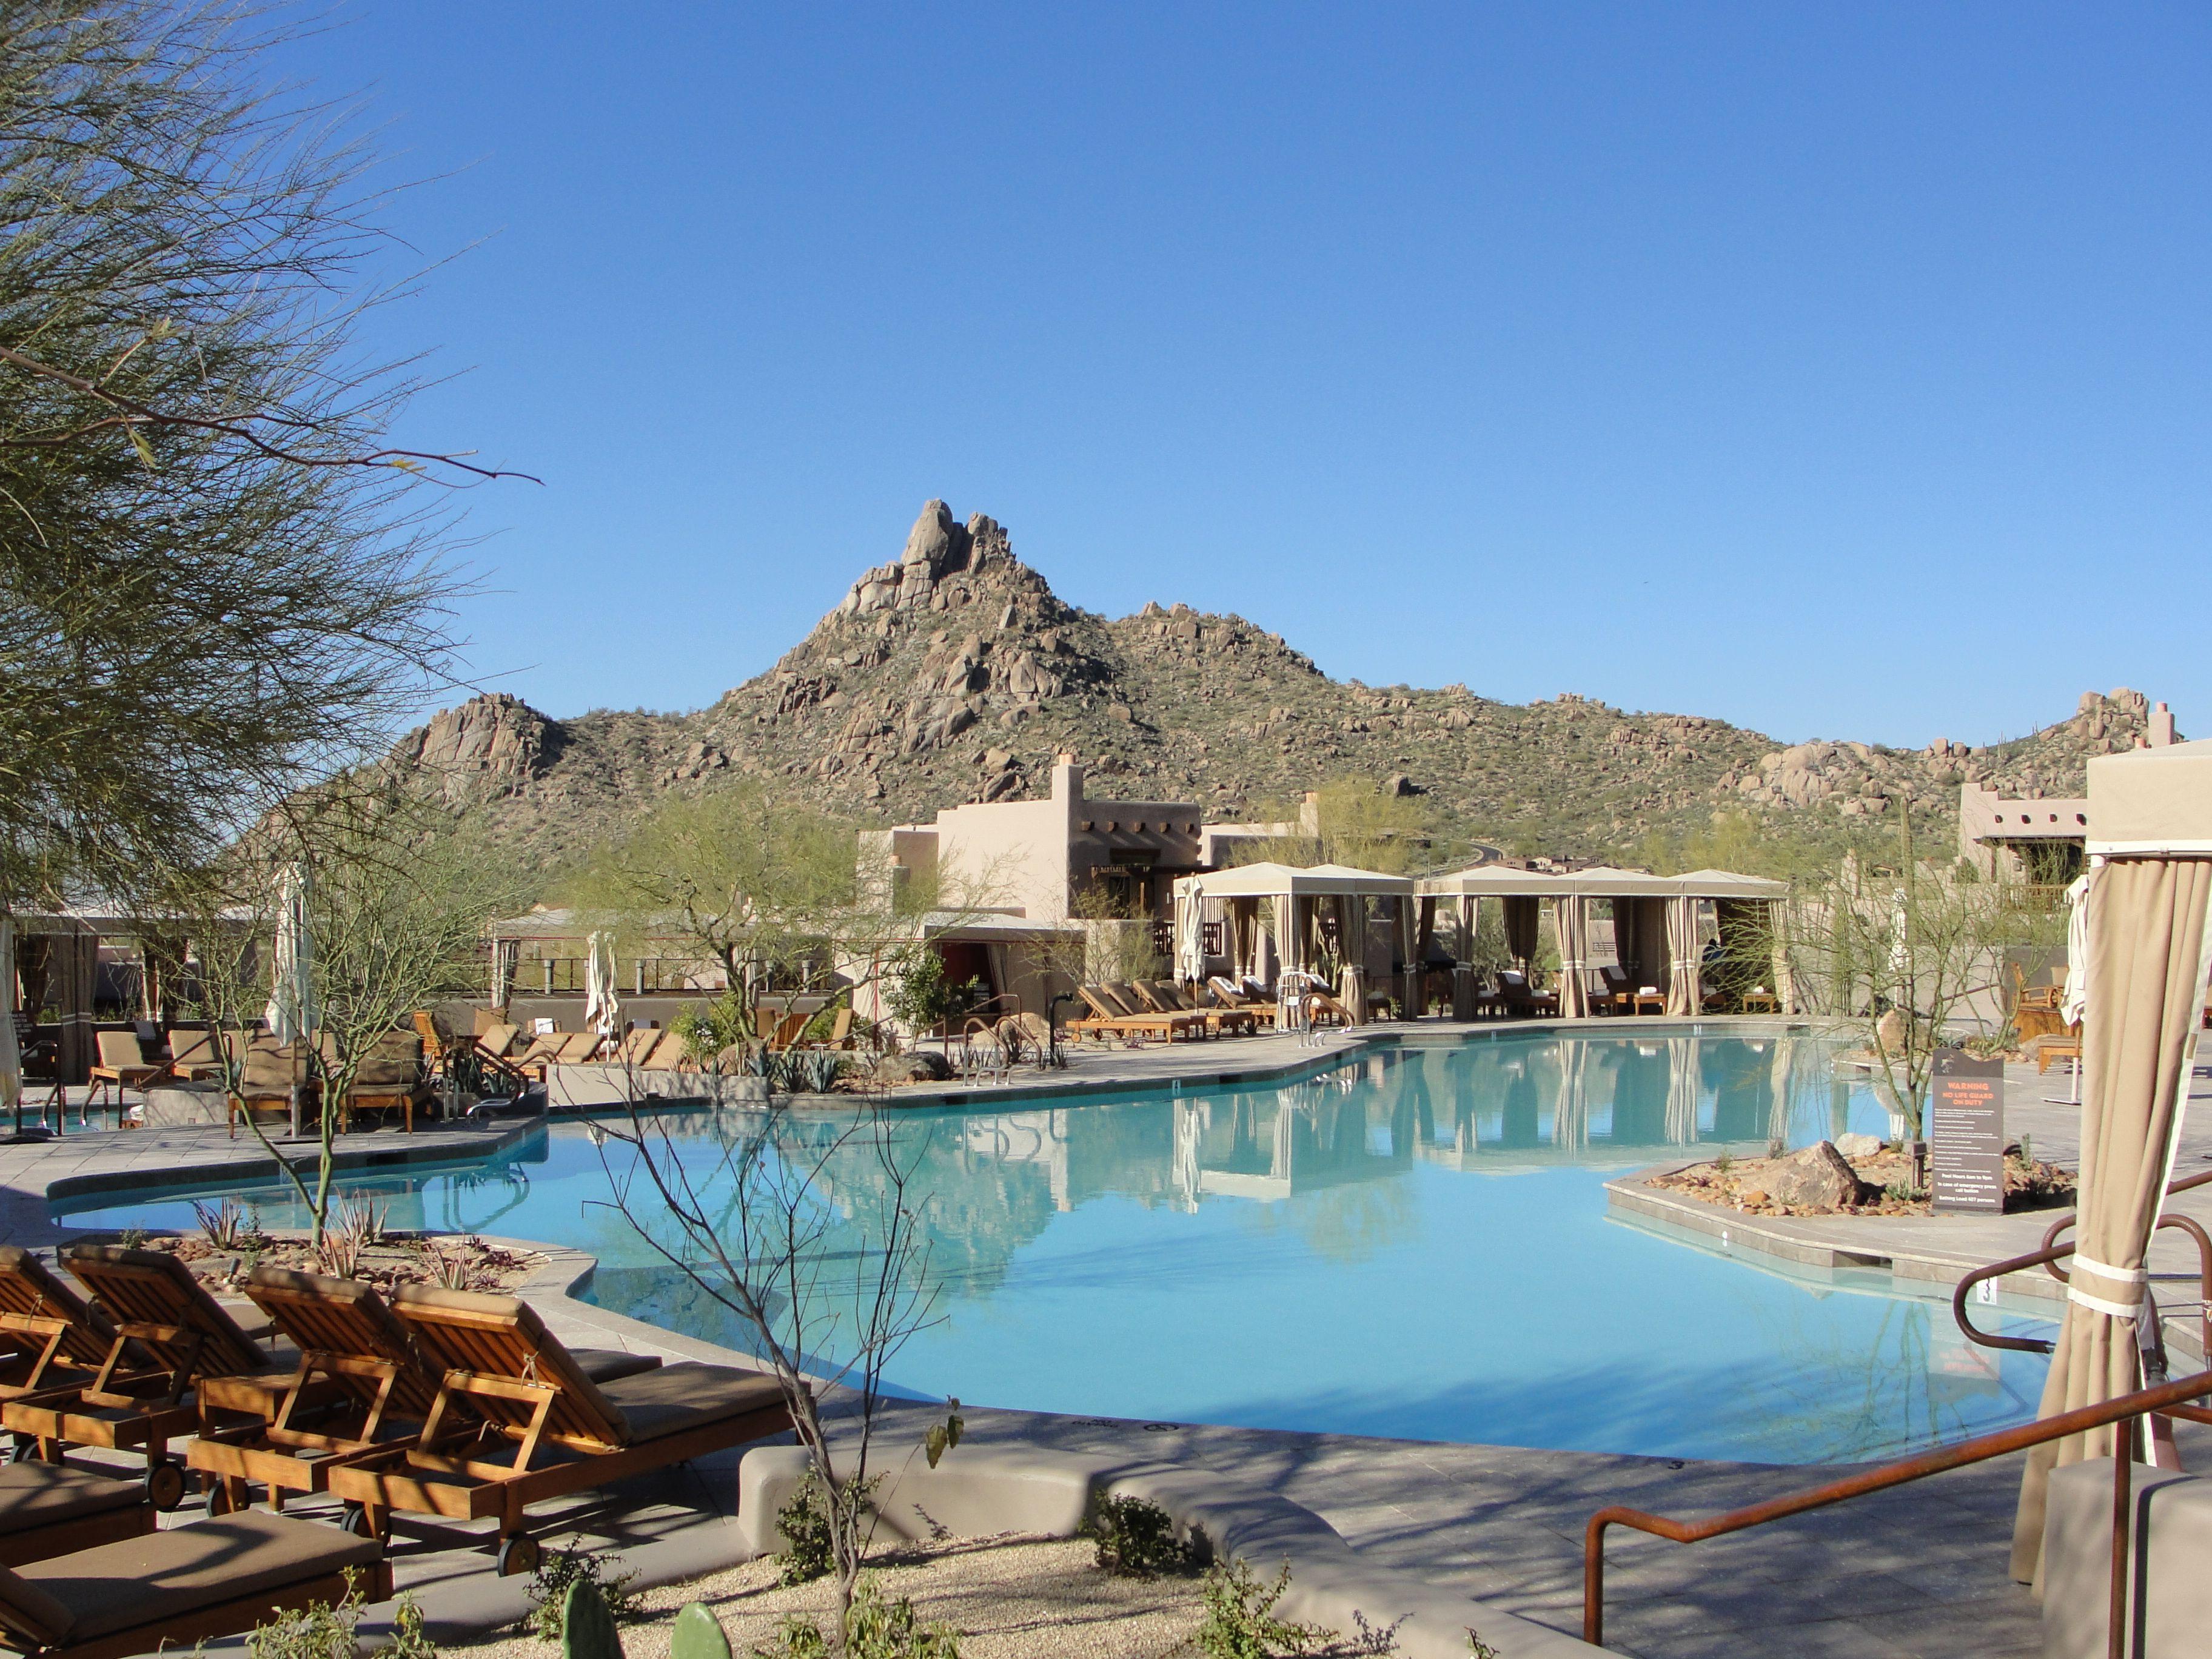 4 Seasons A Mile From Home Scottsdale Az Favorite Places Scottsdale Places